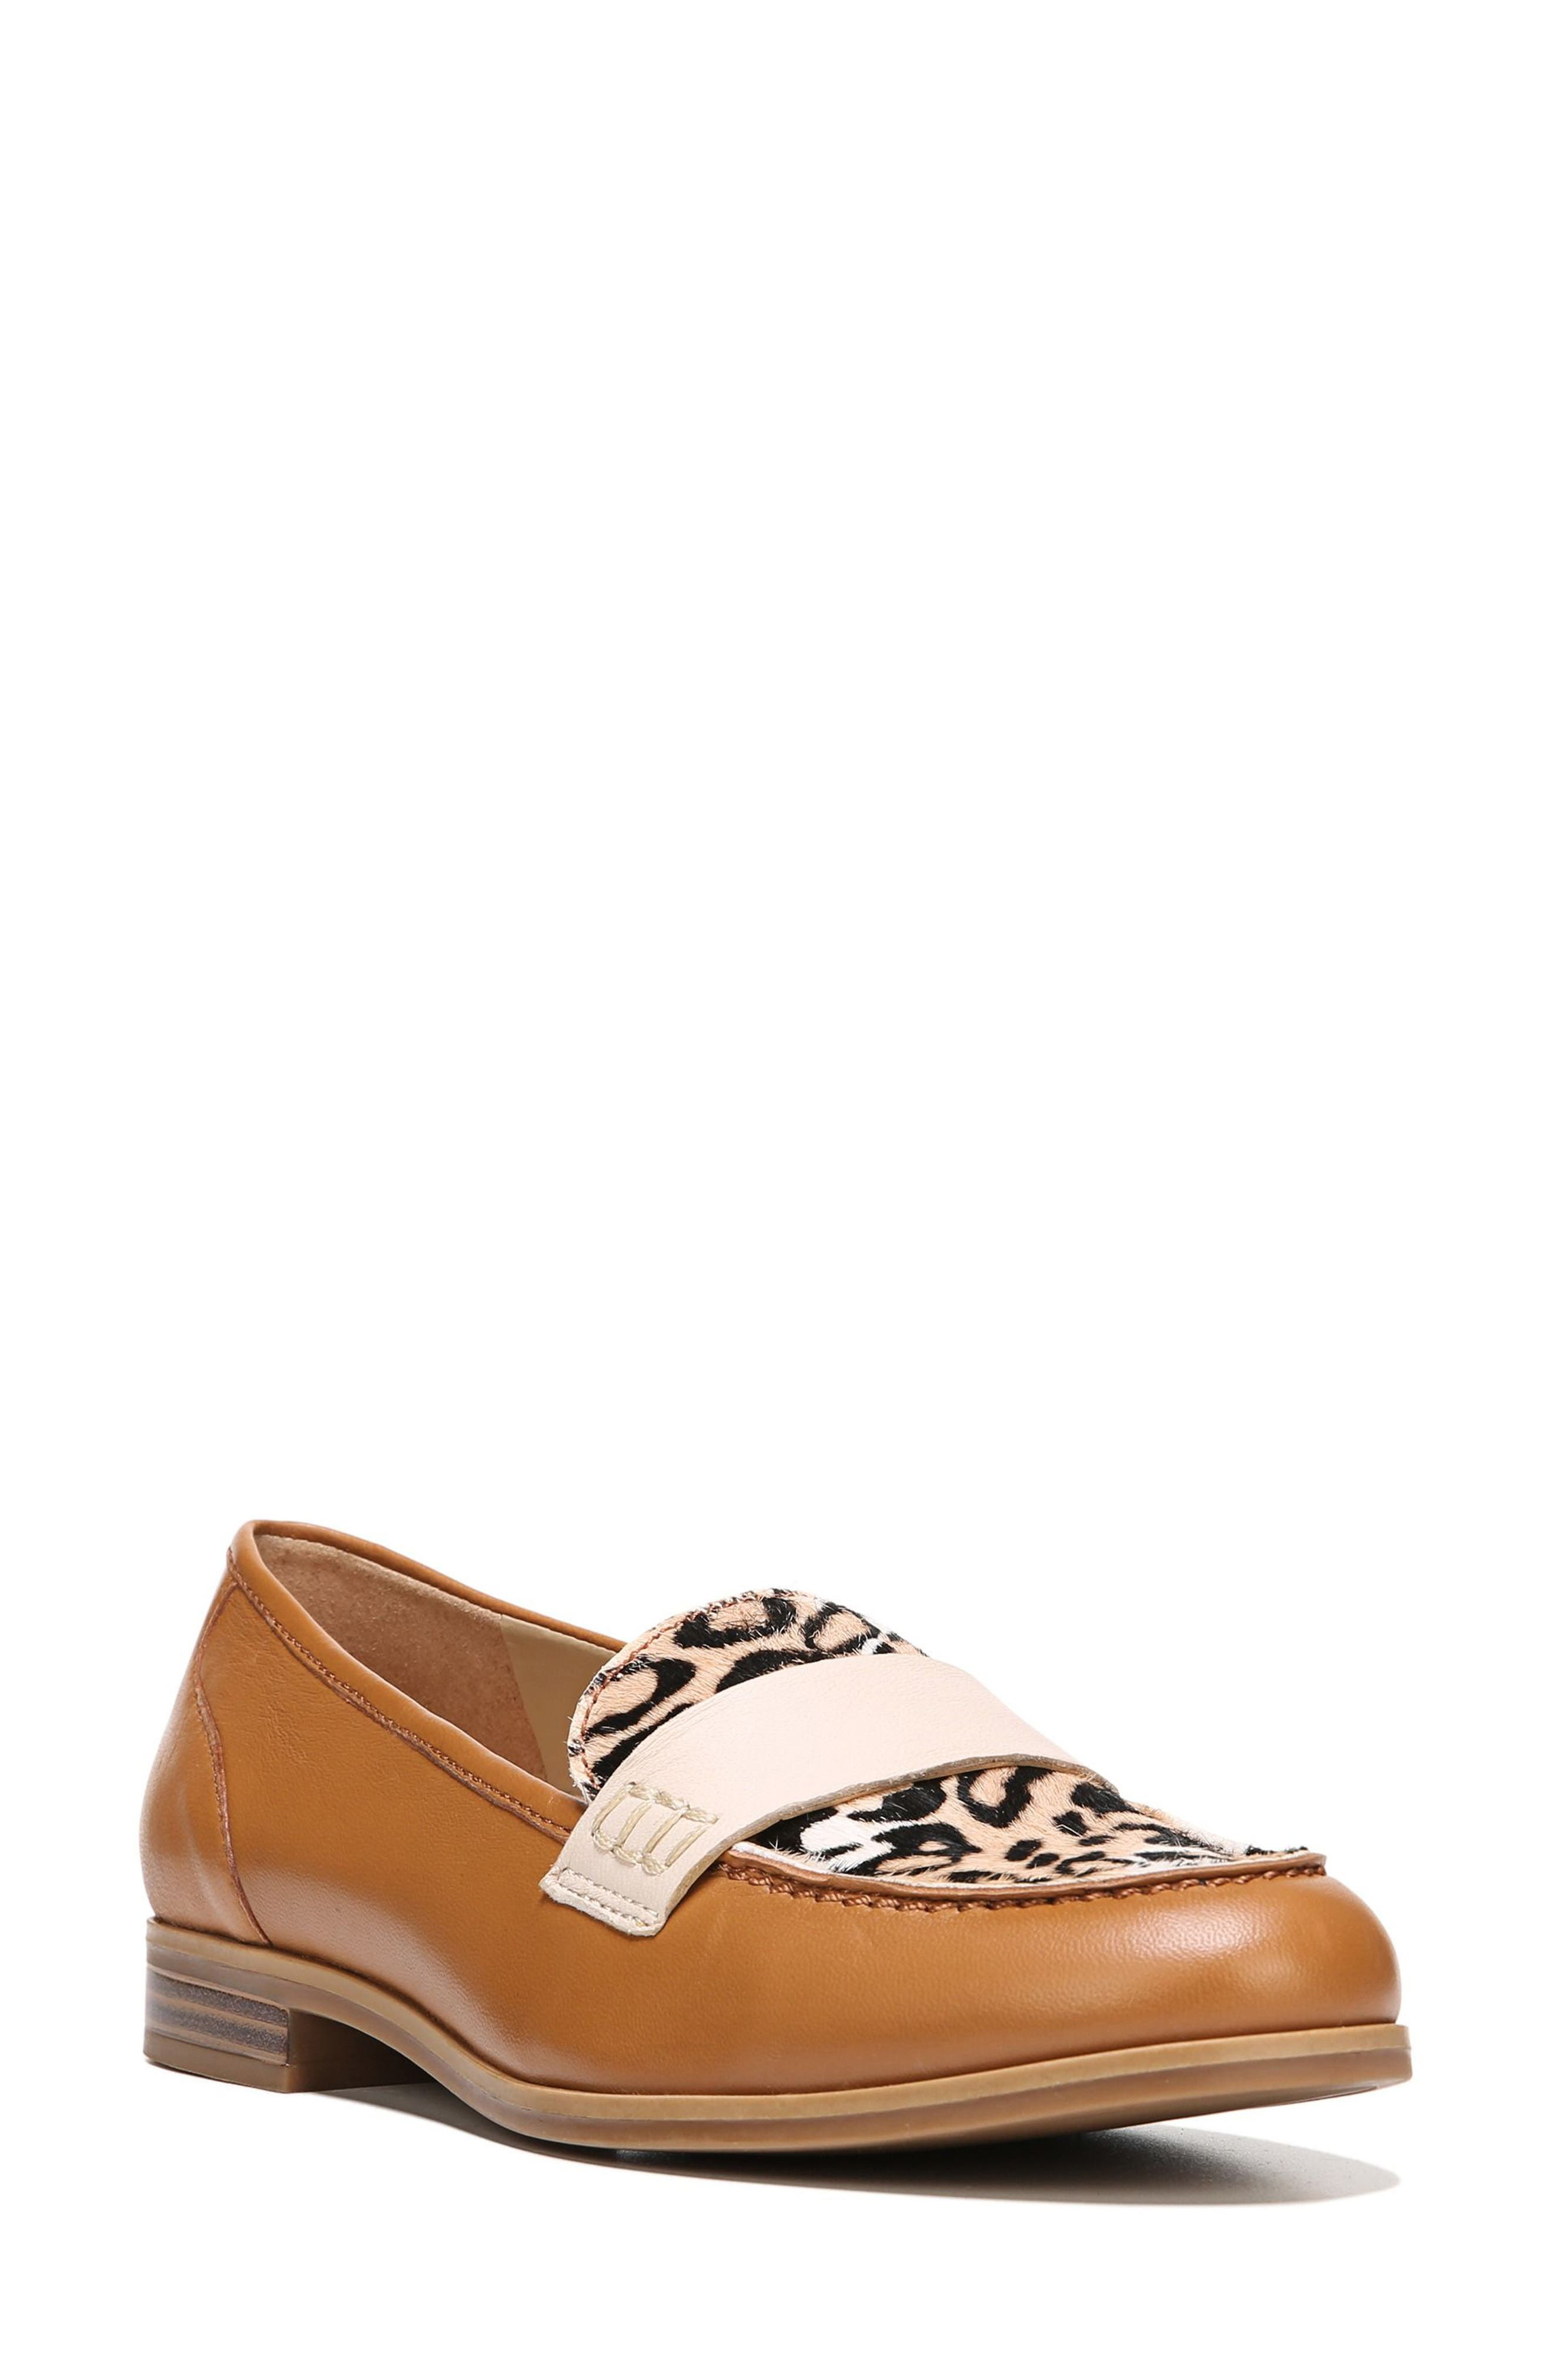 Veronica Loafer,                             Main thumbnail 1, color,                             Cheetah Leather/ Brahma Hair